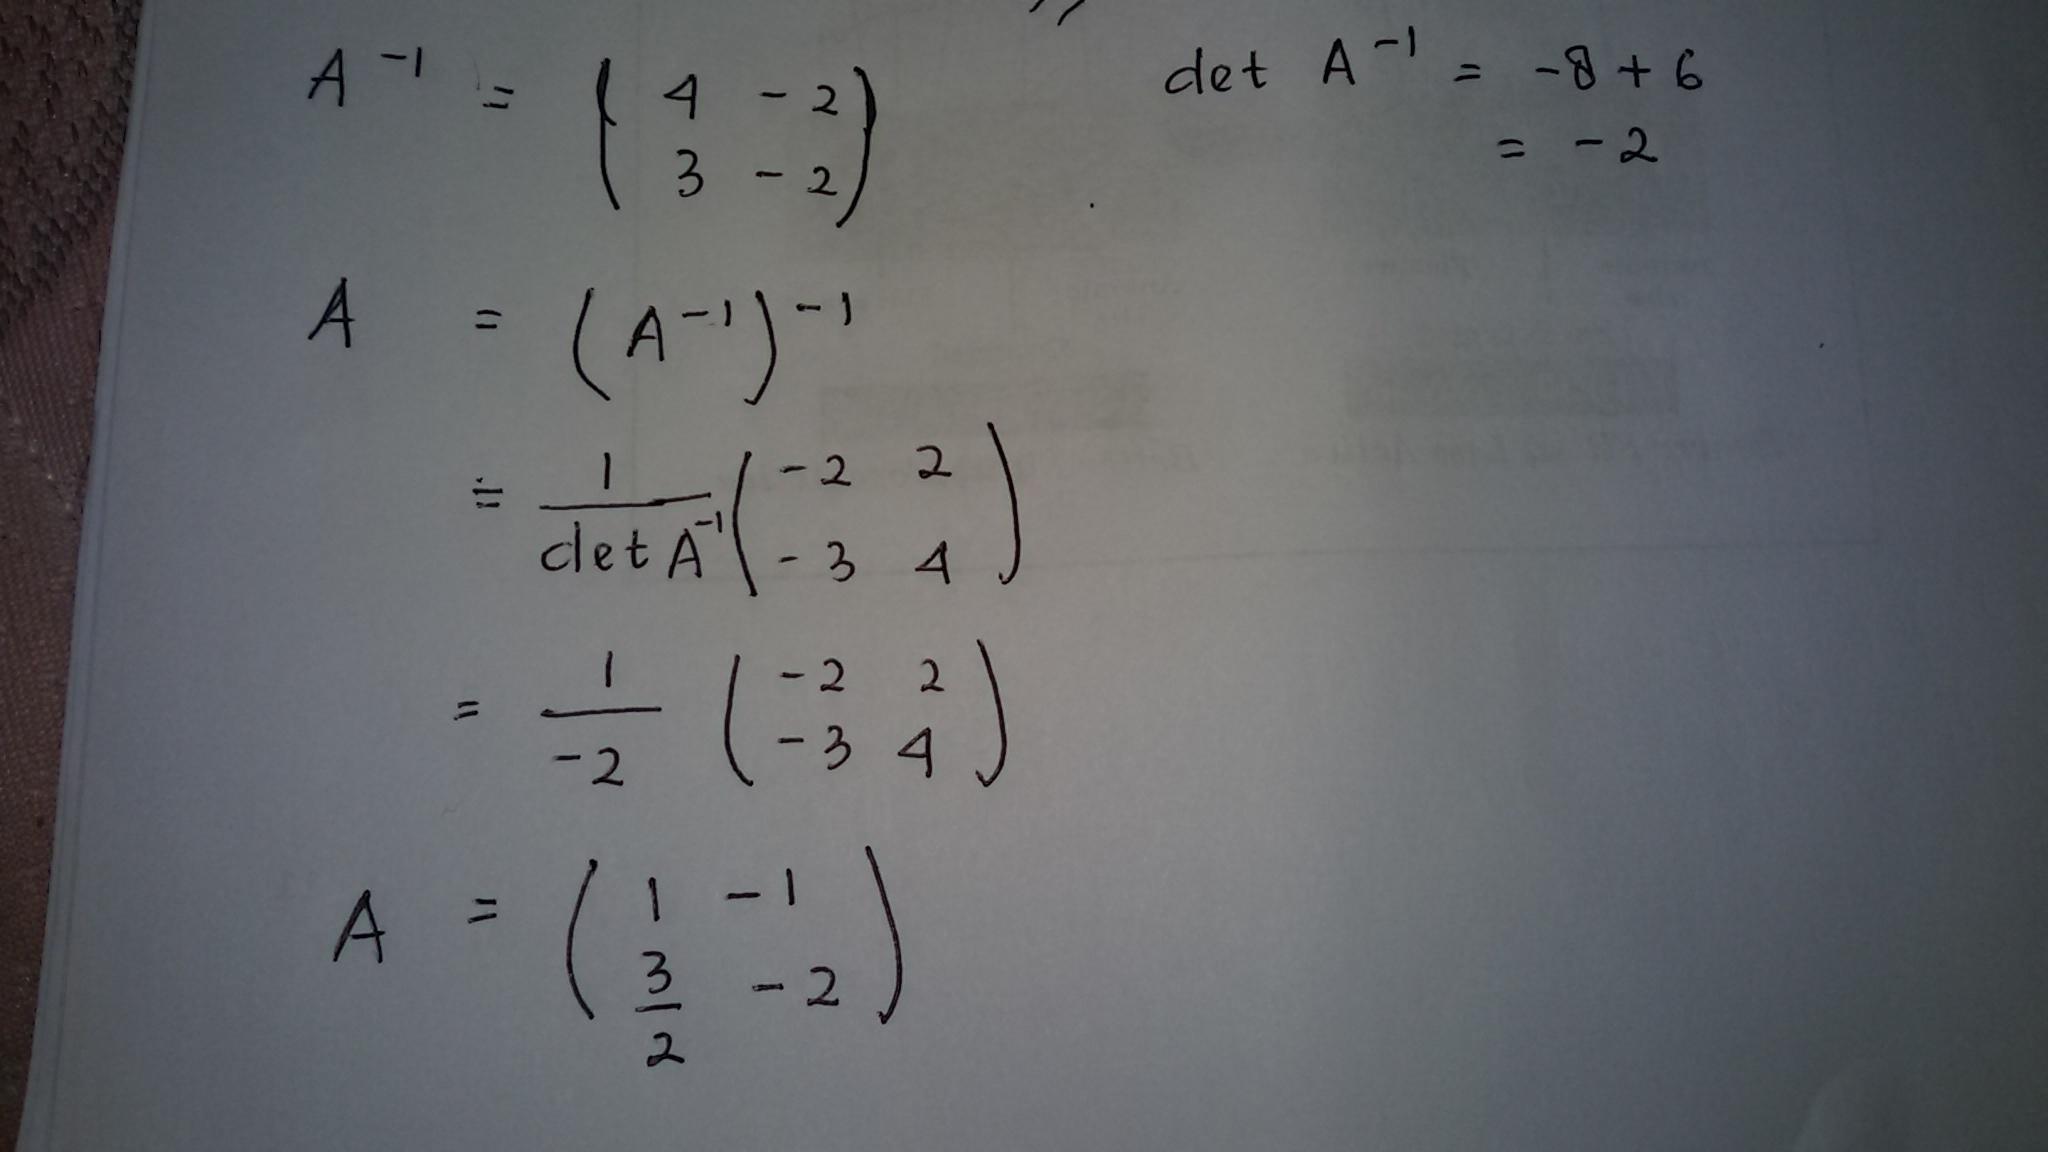 Buatlah Matriks A Berordo 2x2 Yang Memiliki Invers Matriks A 1 4 2 Brainly Co Id